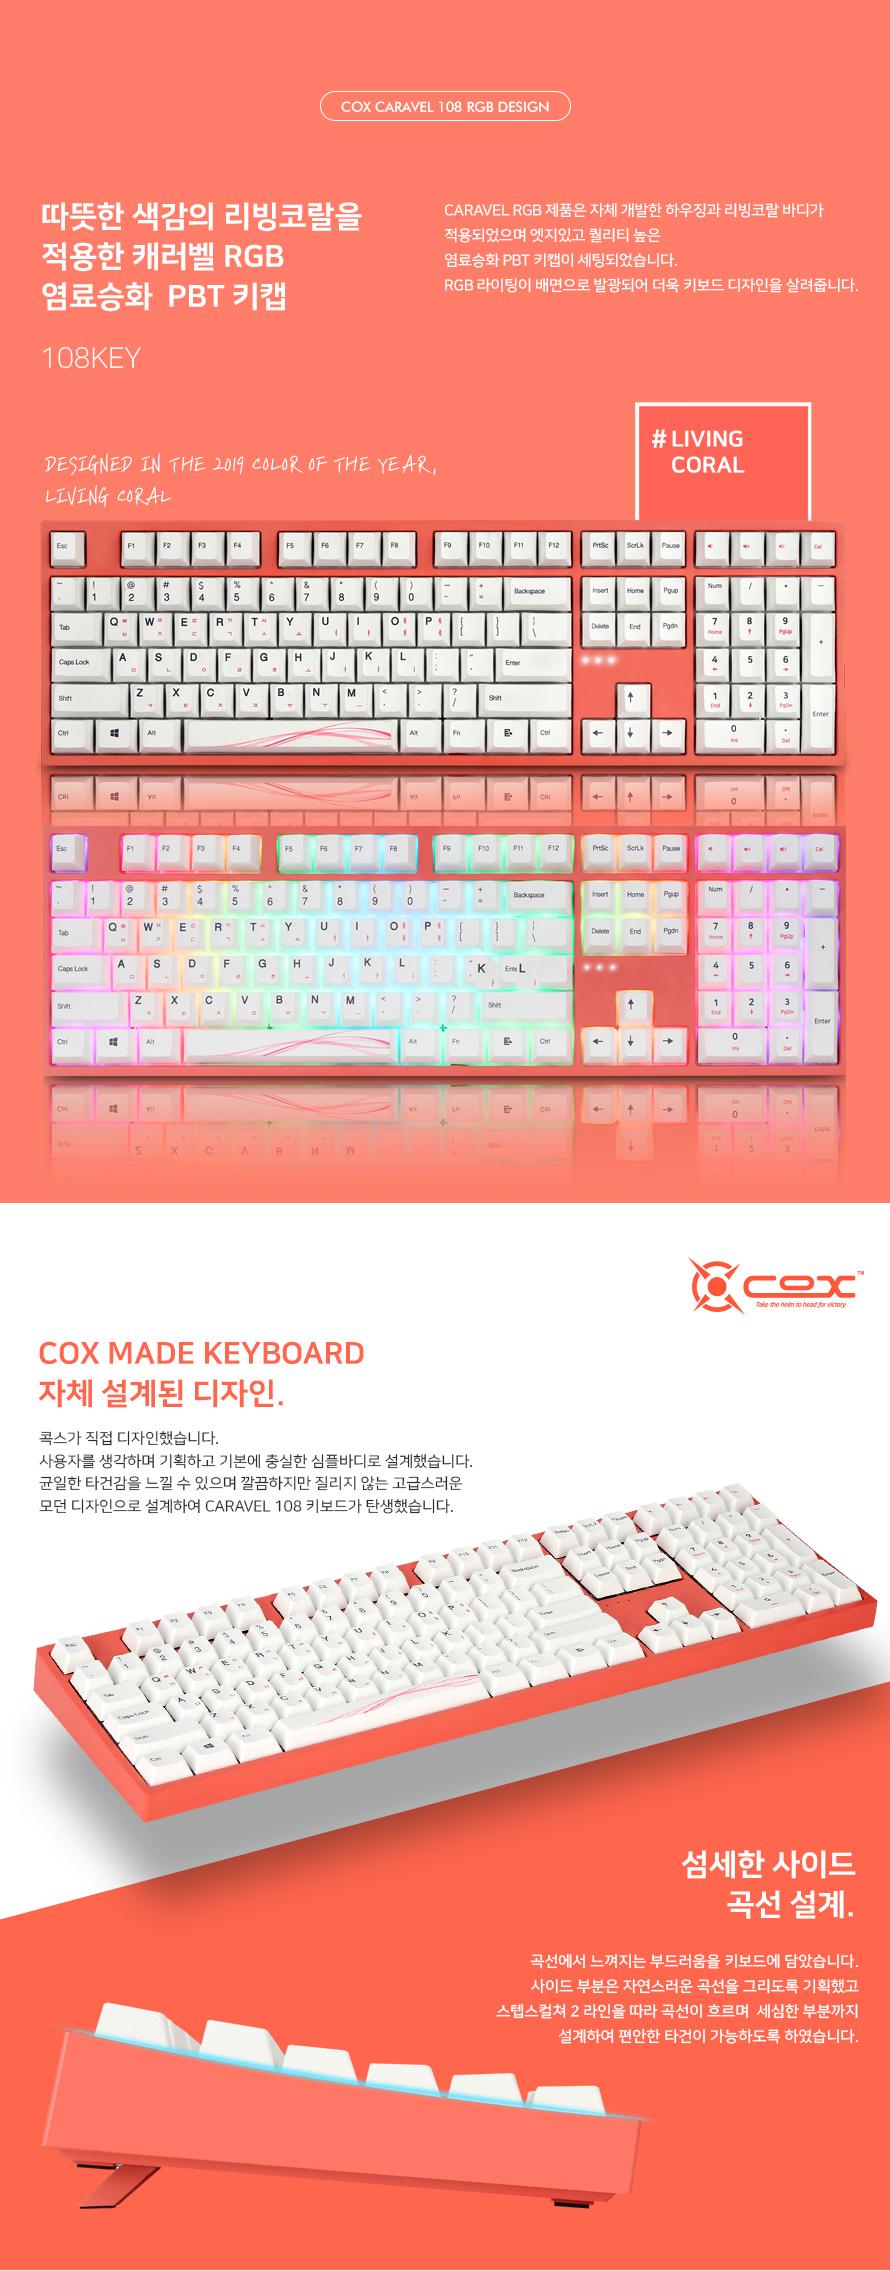 COX  CARAVEL108 게이트론 교체축 RGB 염료승화 PBT 리빙코랄(황축)